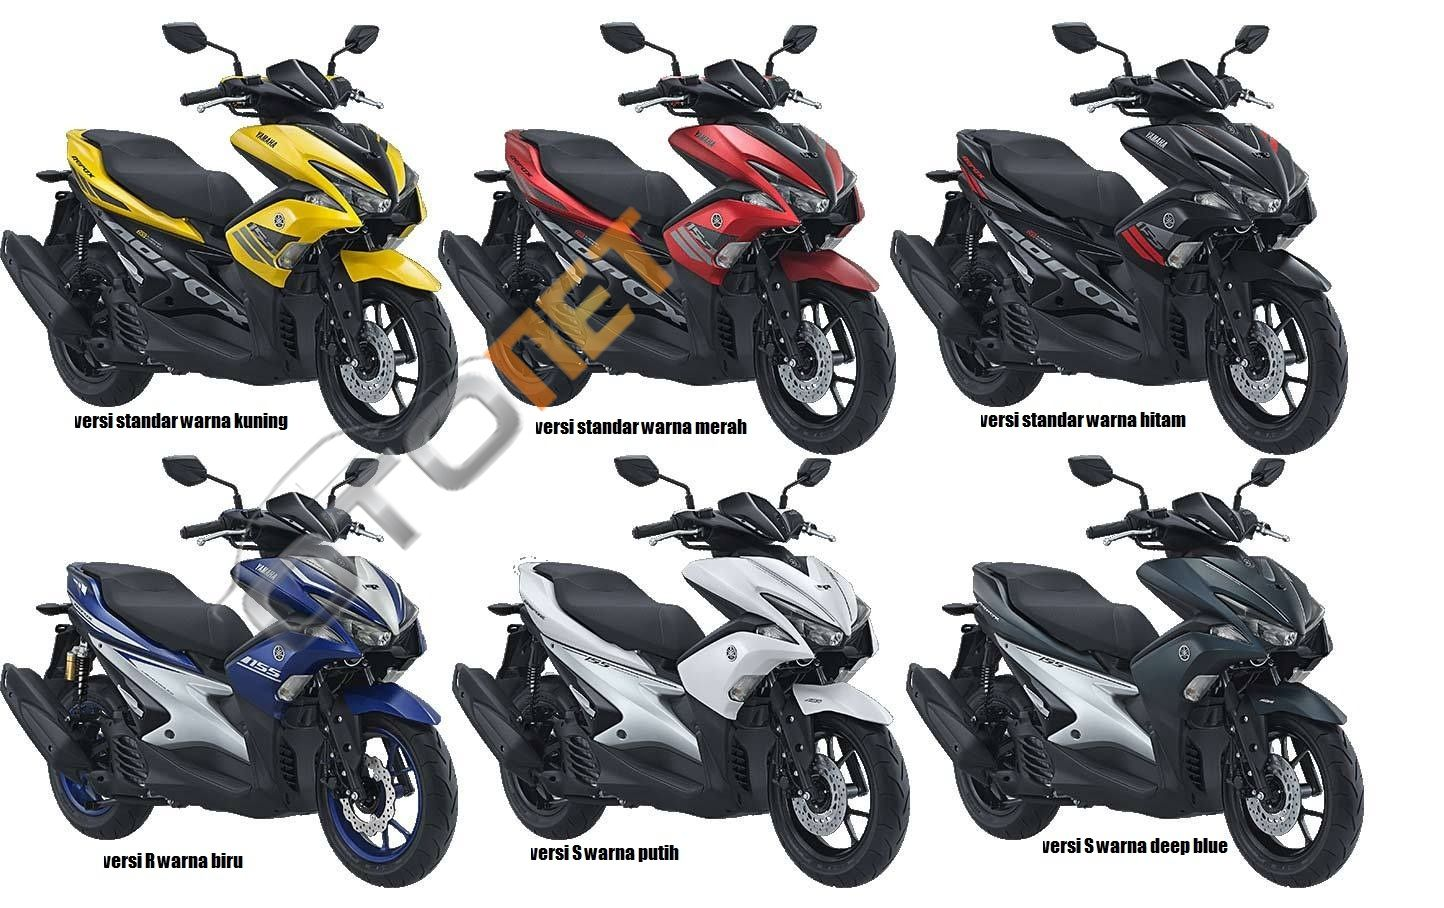 Harga SparePart Yamaha Aerox 155 Ori Agustus 2018 Motor